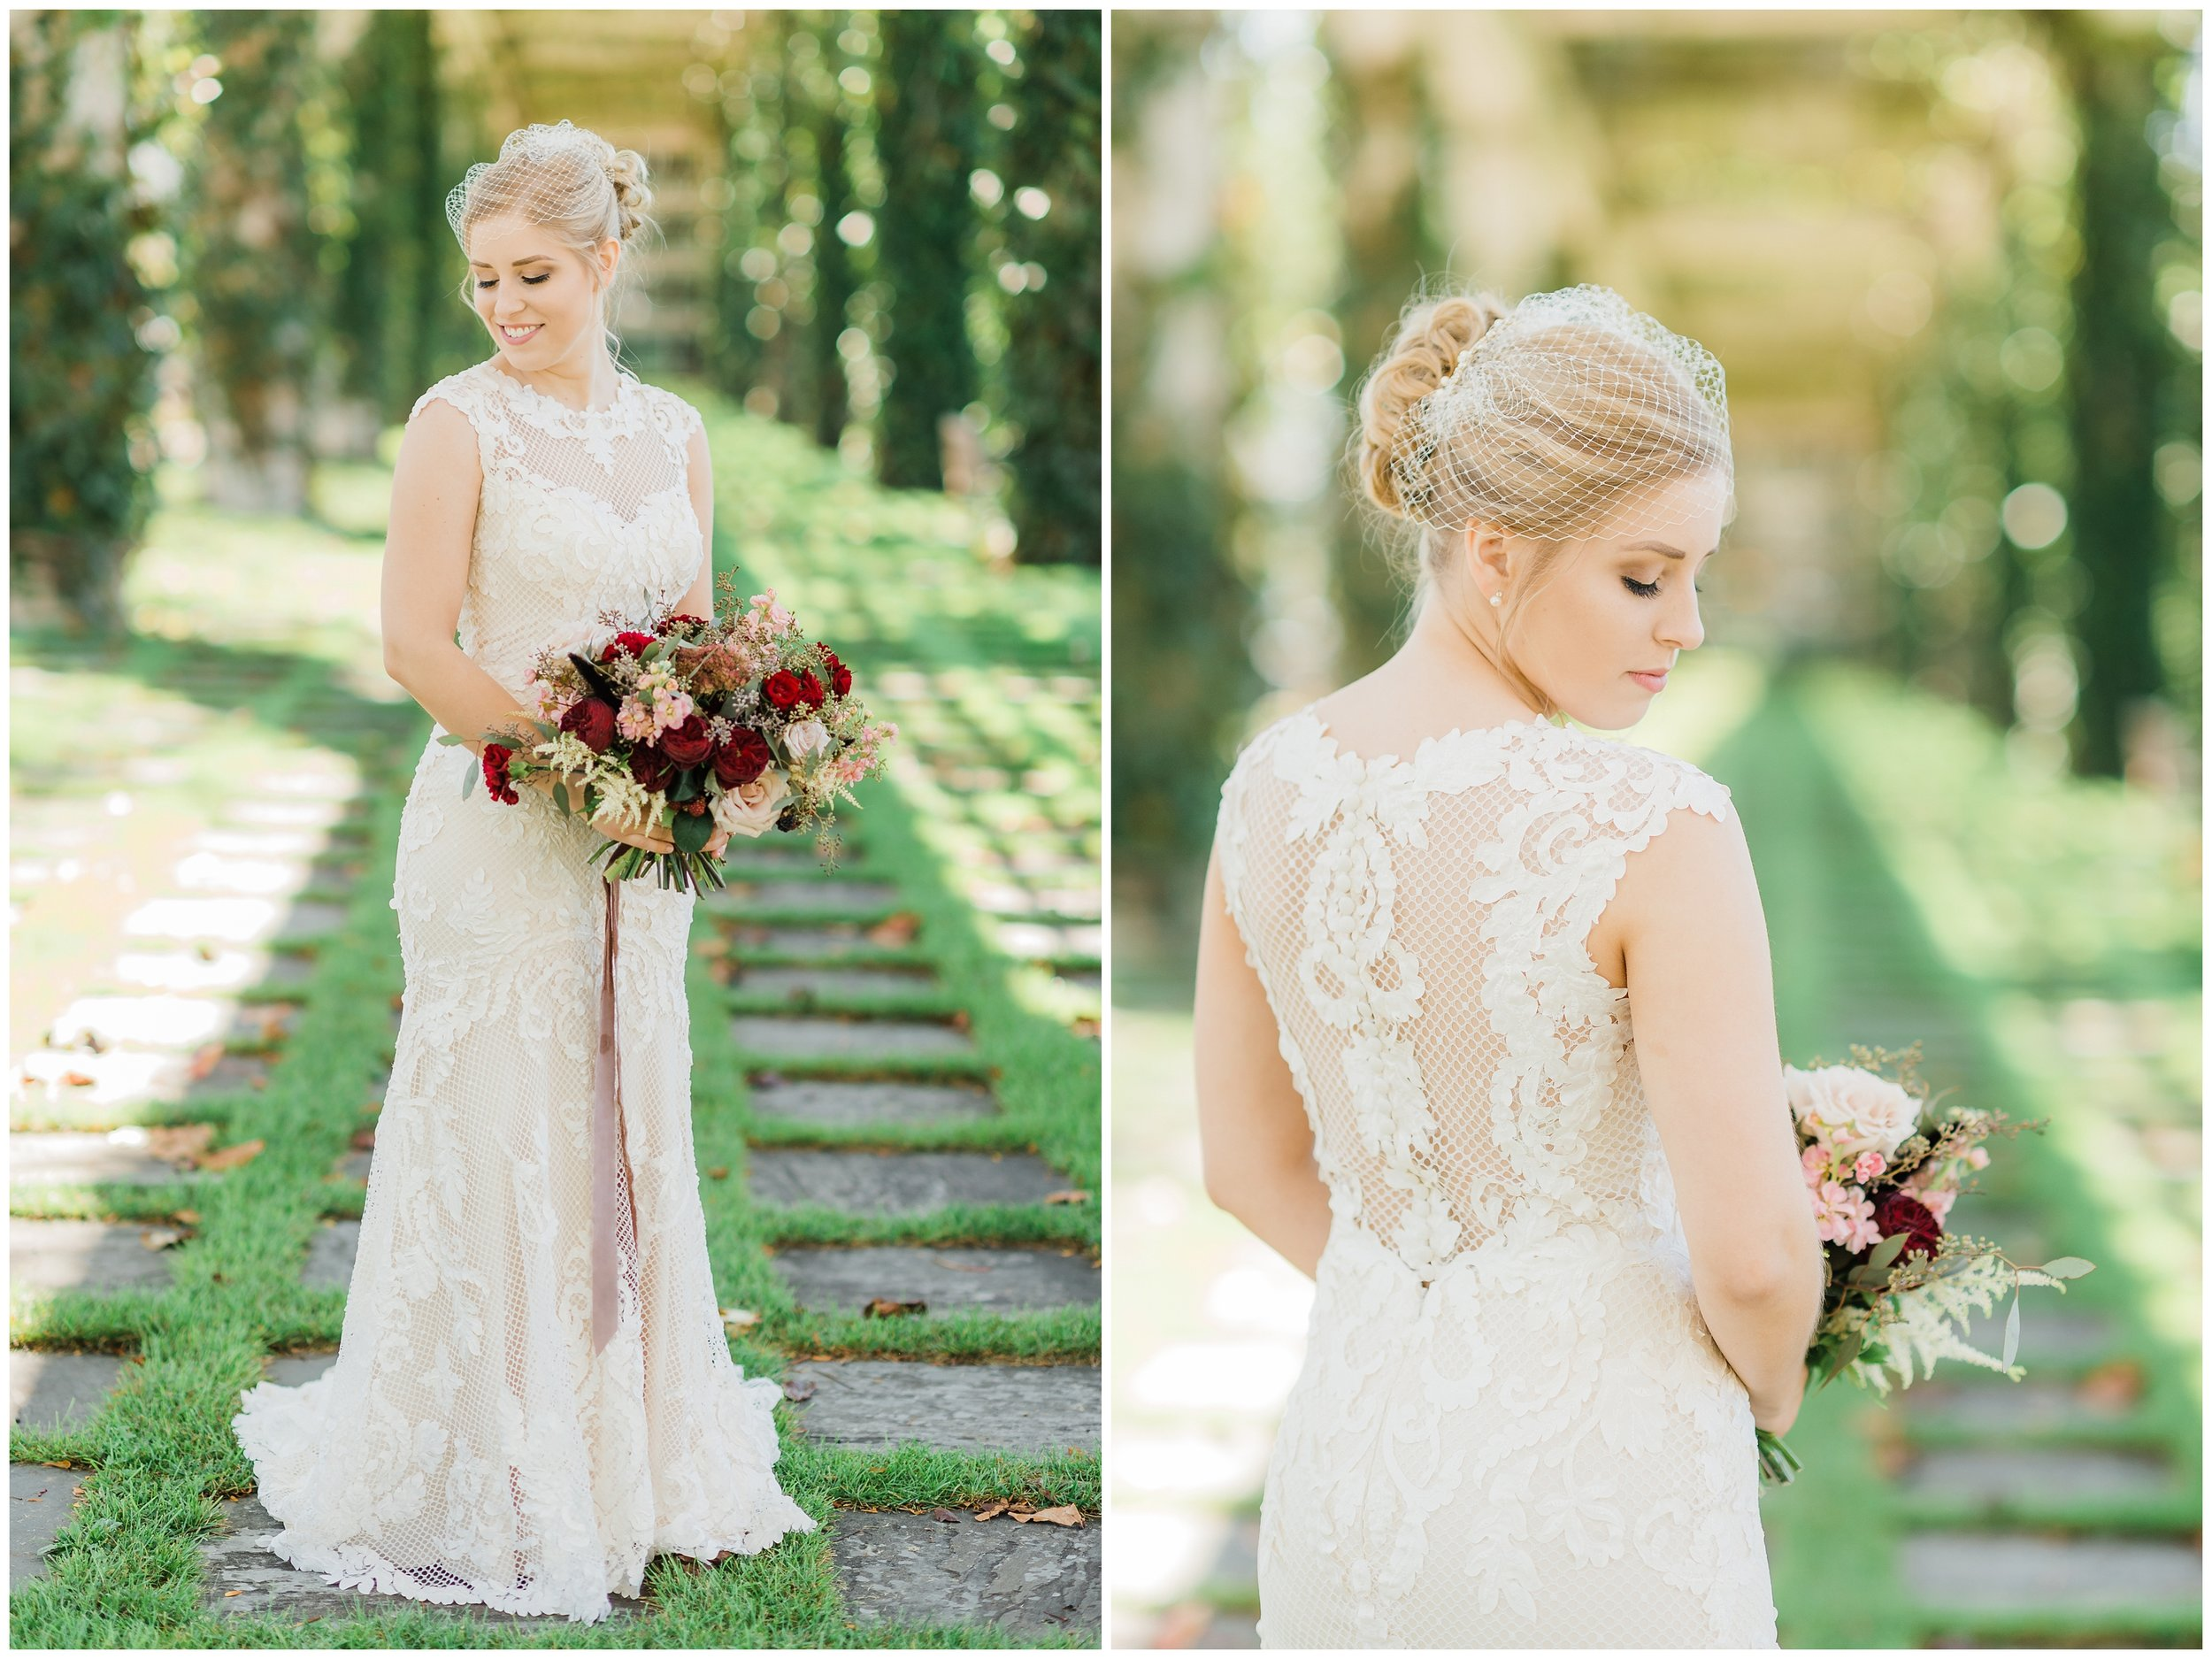 Rebecca_Shehorn_Photography_Indianapolis_Wedding_Photographer_7318.jpg